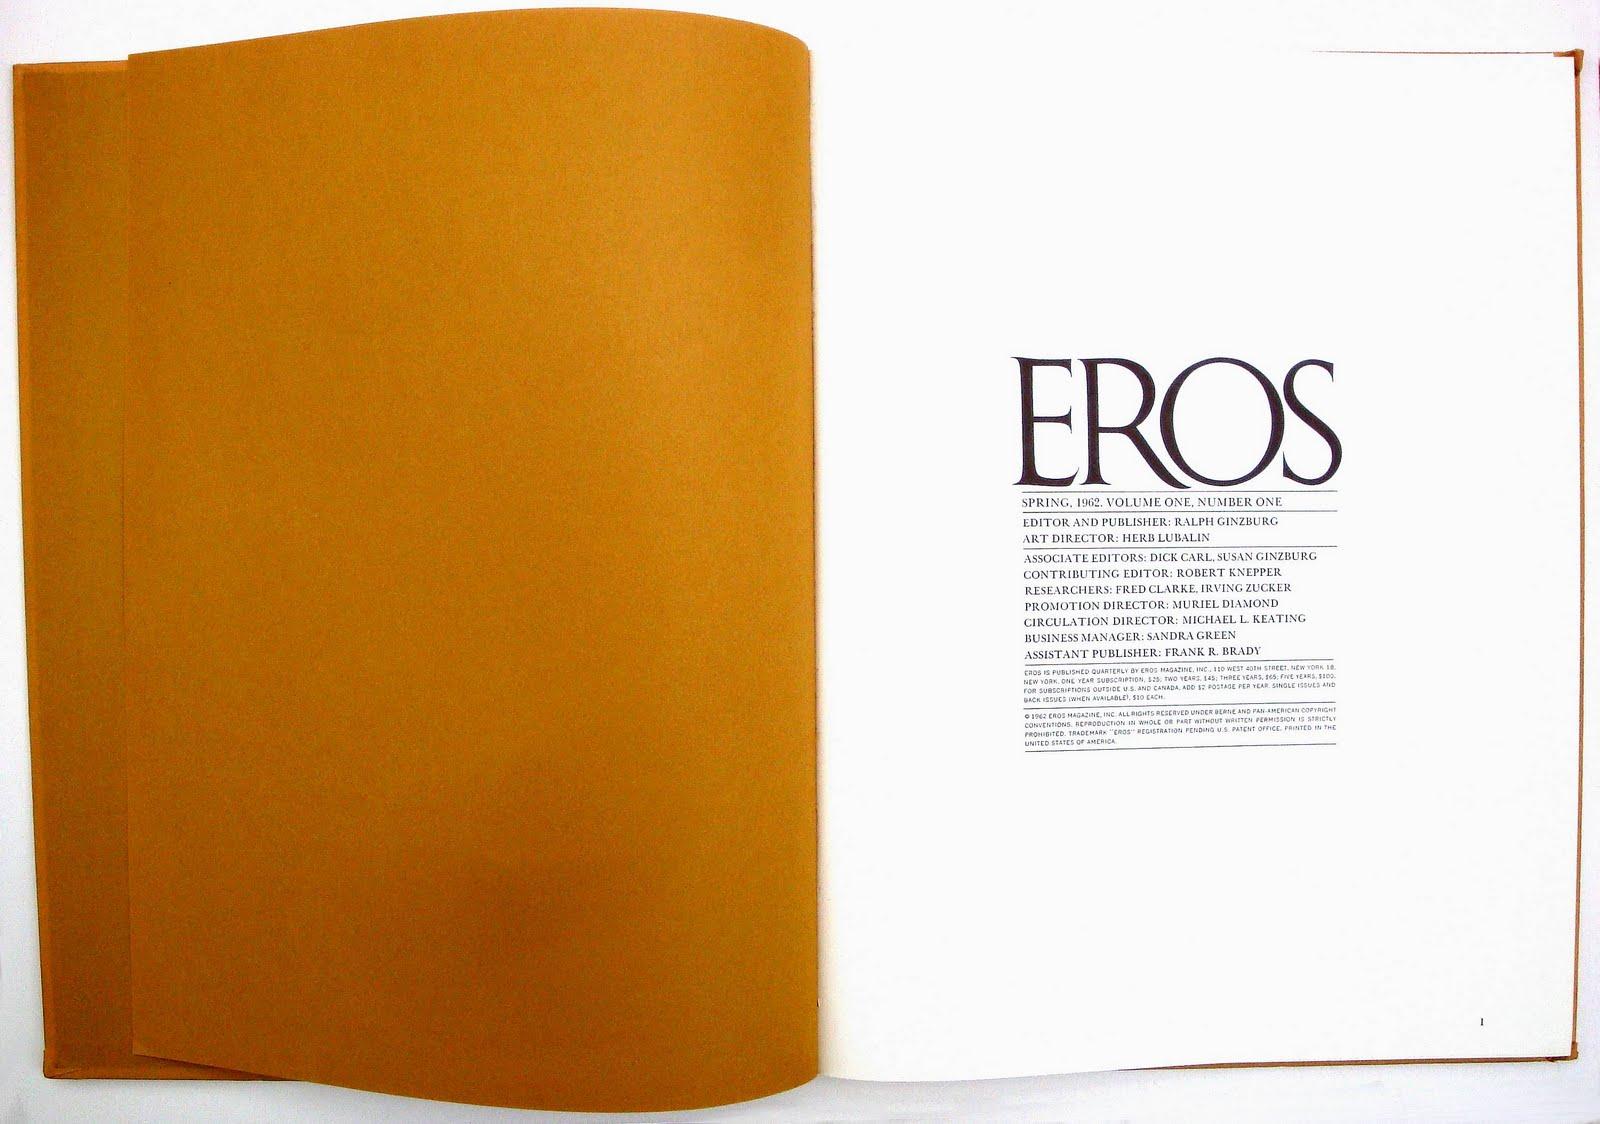 Eros-1-003.jpg